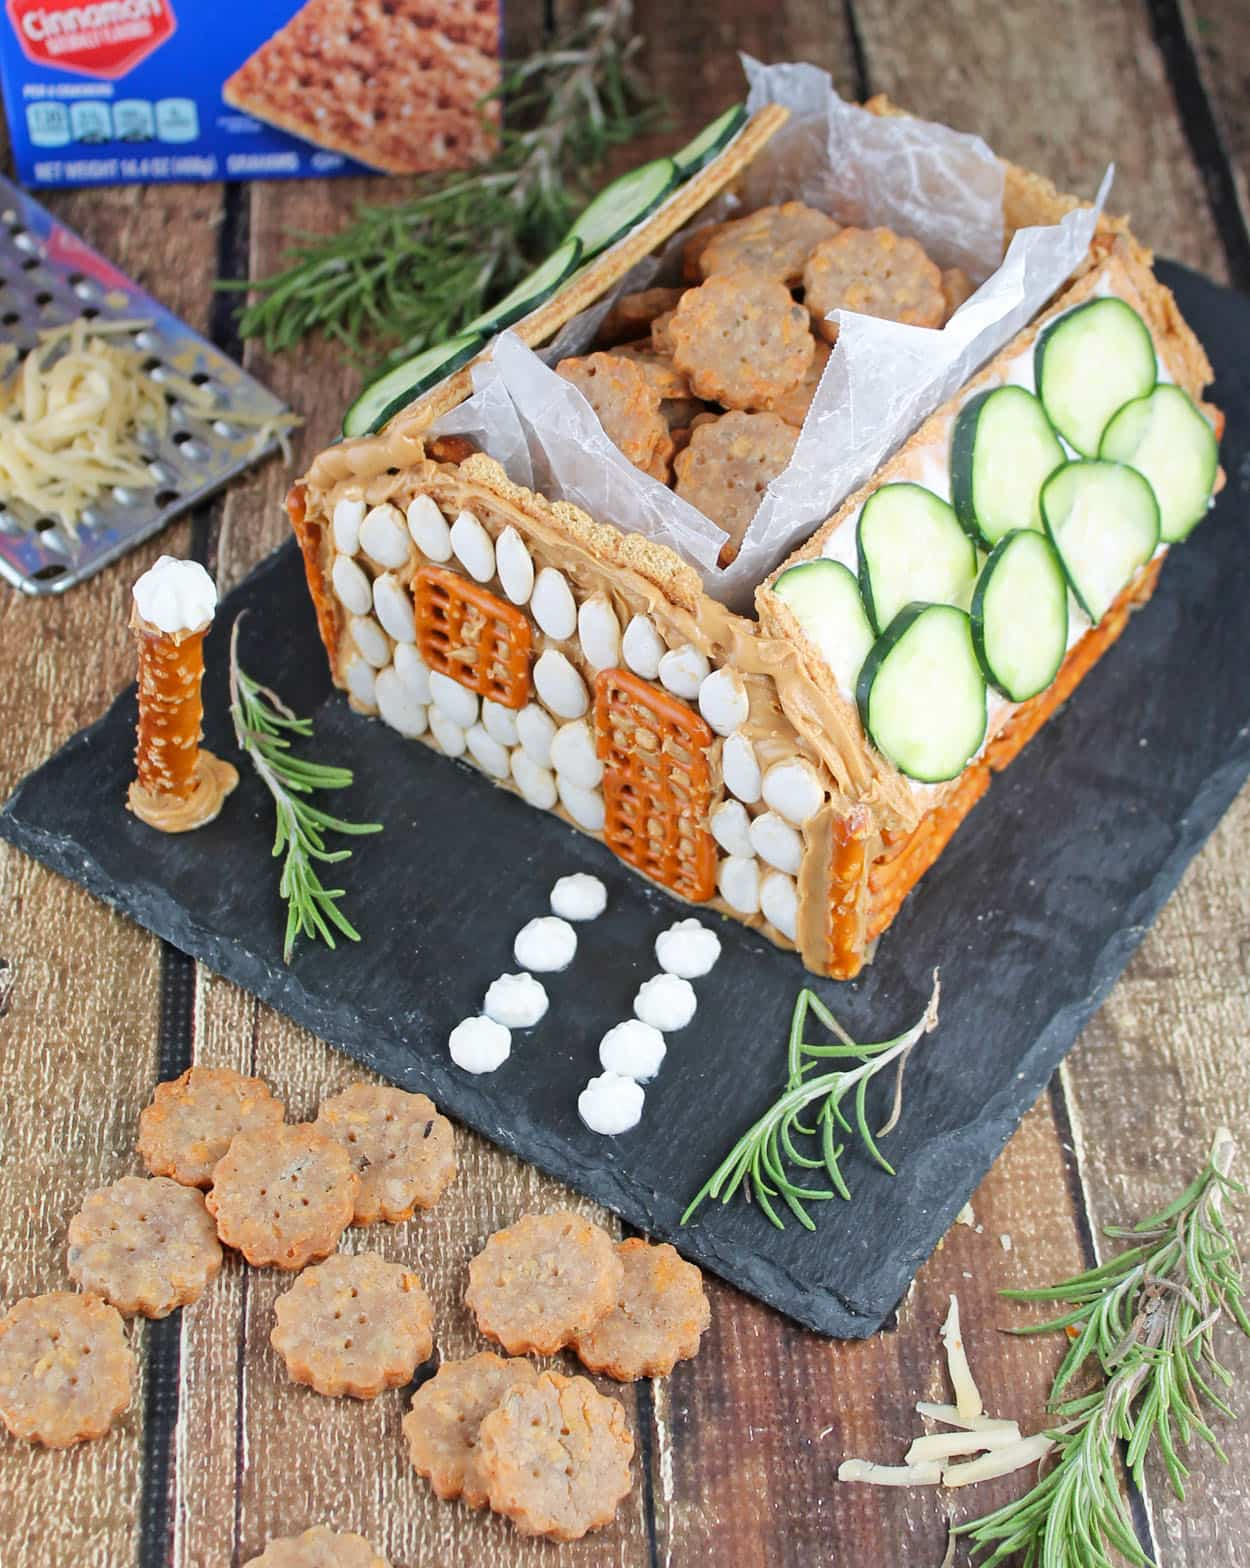 Rosemary Gouda Crackers in a #HoneyMaidHouse